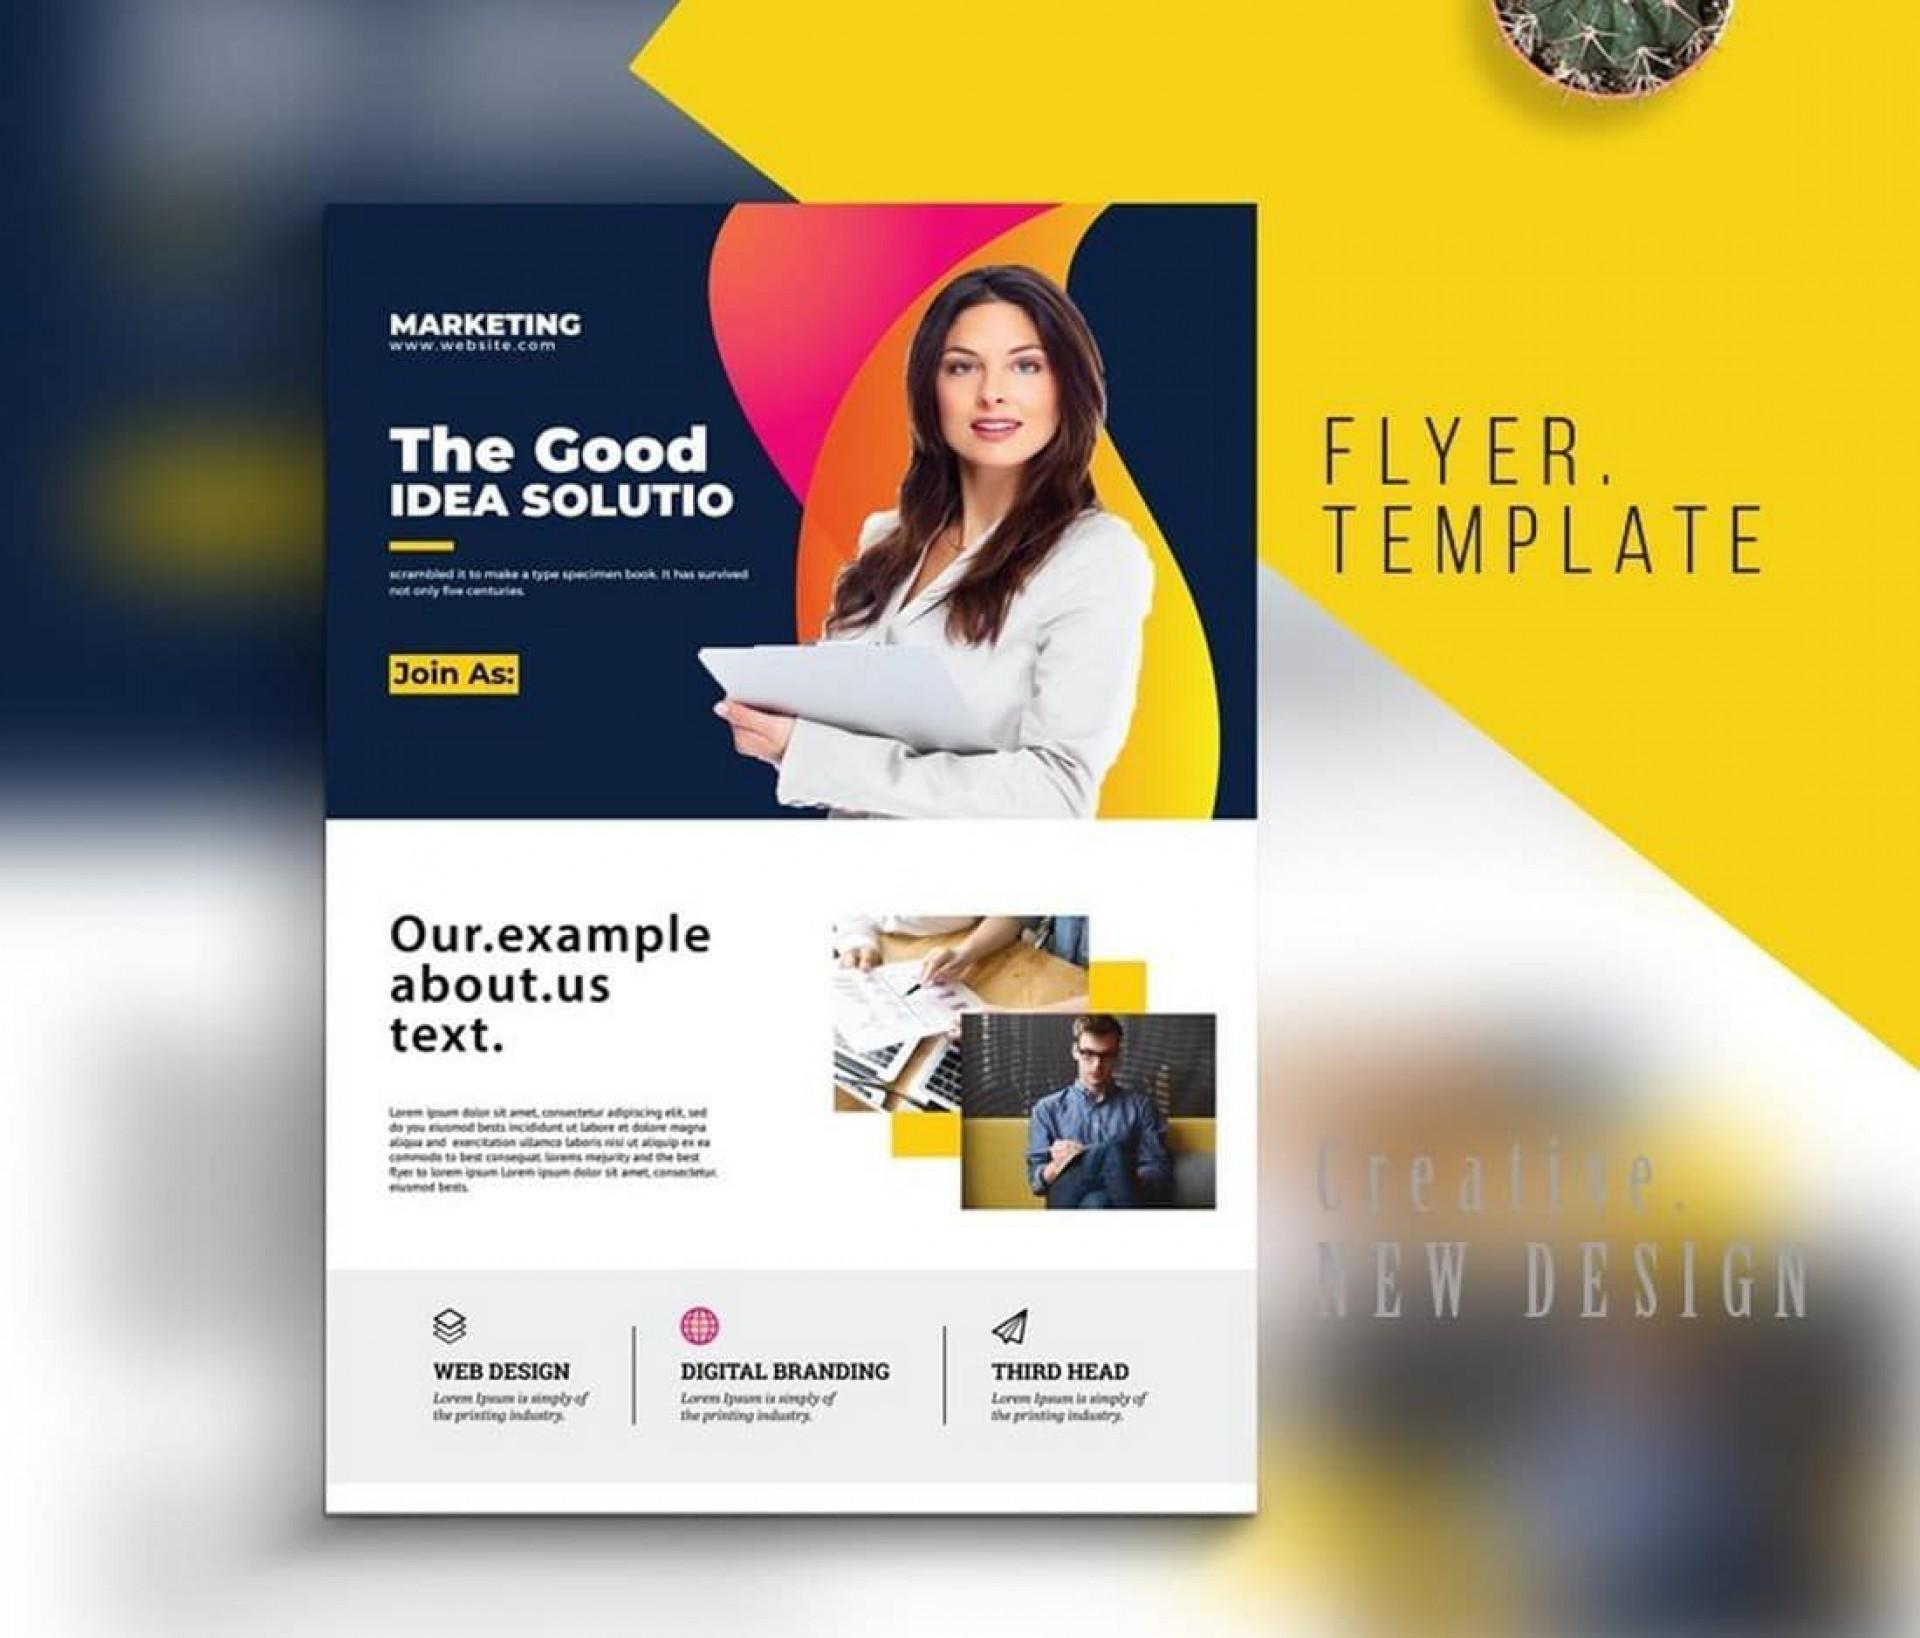 011 Striking Free Flyer Design Template Idea  Templates Online Download Psd1920